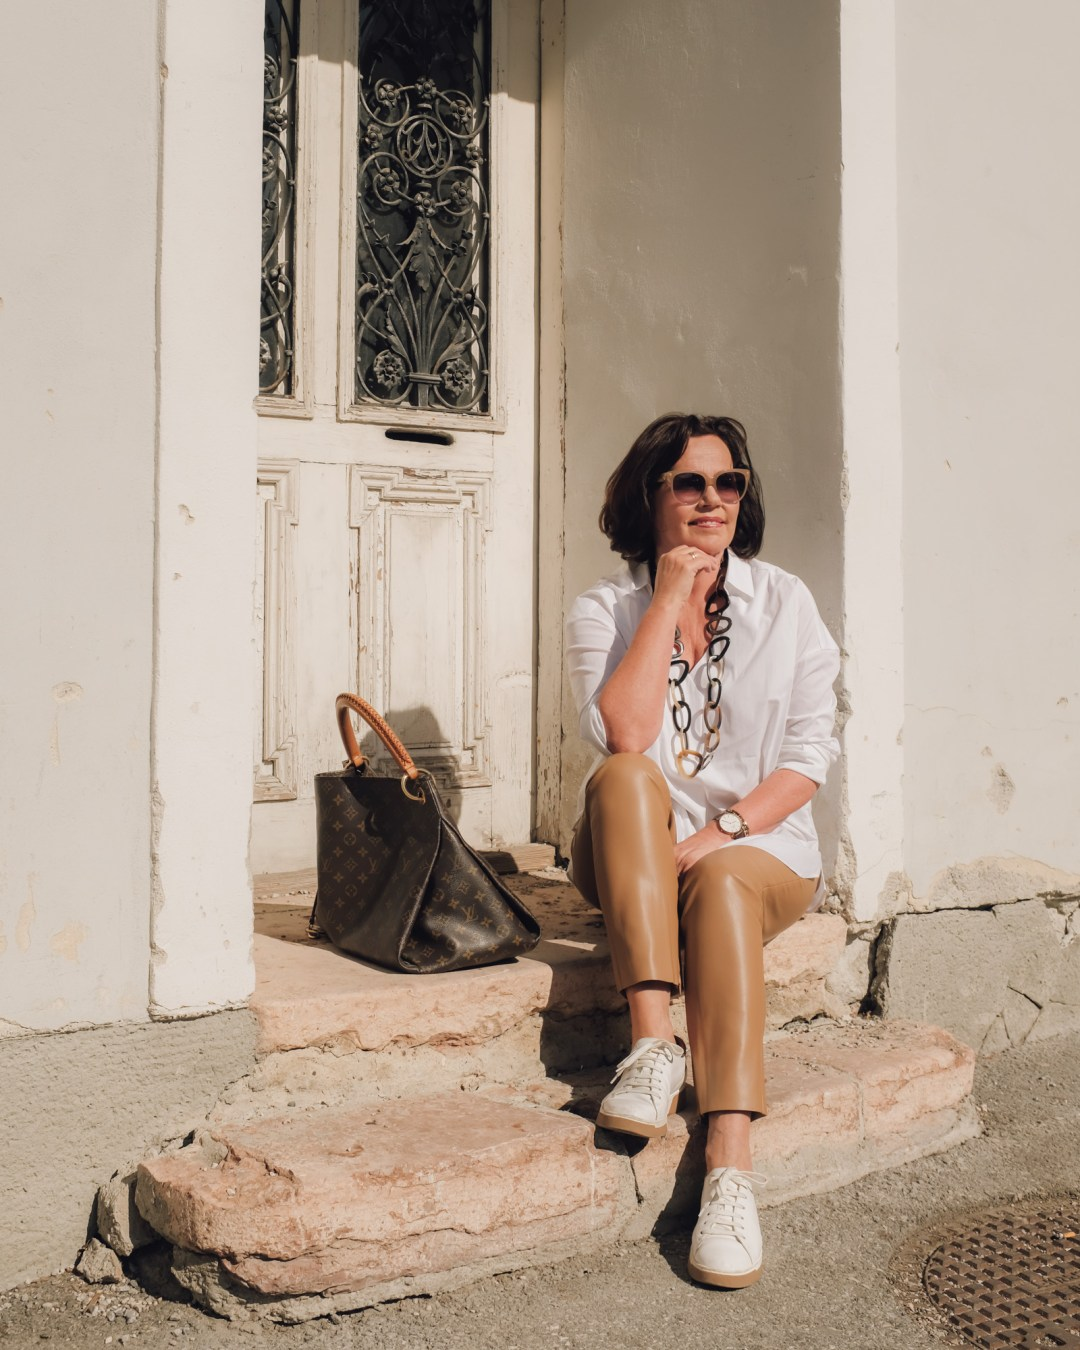 Inastil, Blazer, Lederhose, weiße Bluse, weiße Sneaker, Classystyle, Stilberatung, Modeberatung, Frühlingsmode, Ü50Mode, Styleover50, Hallein-10